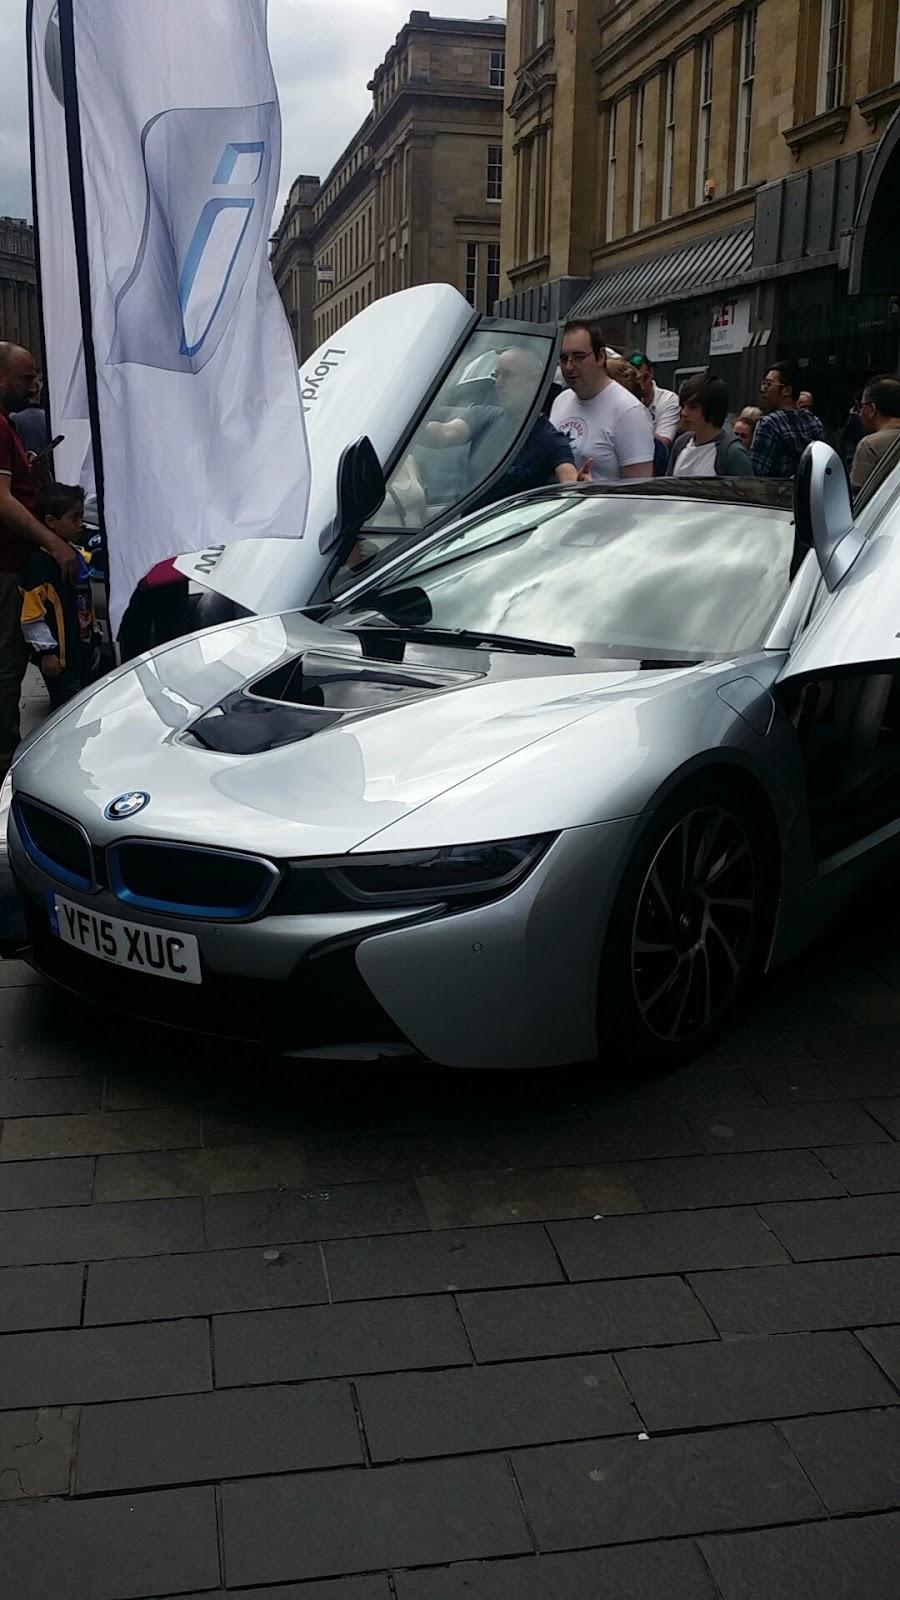 Newcastle Car Show